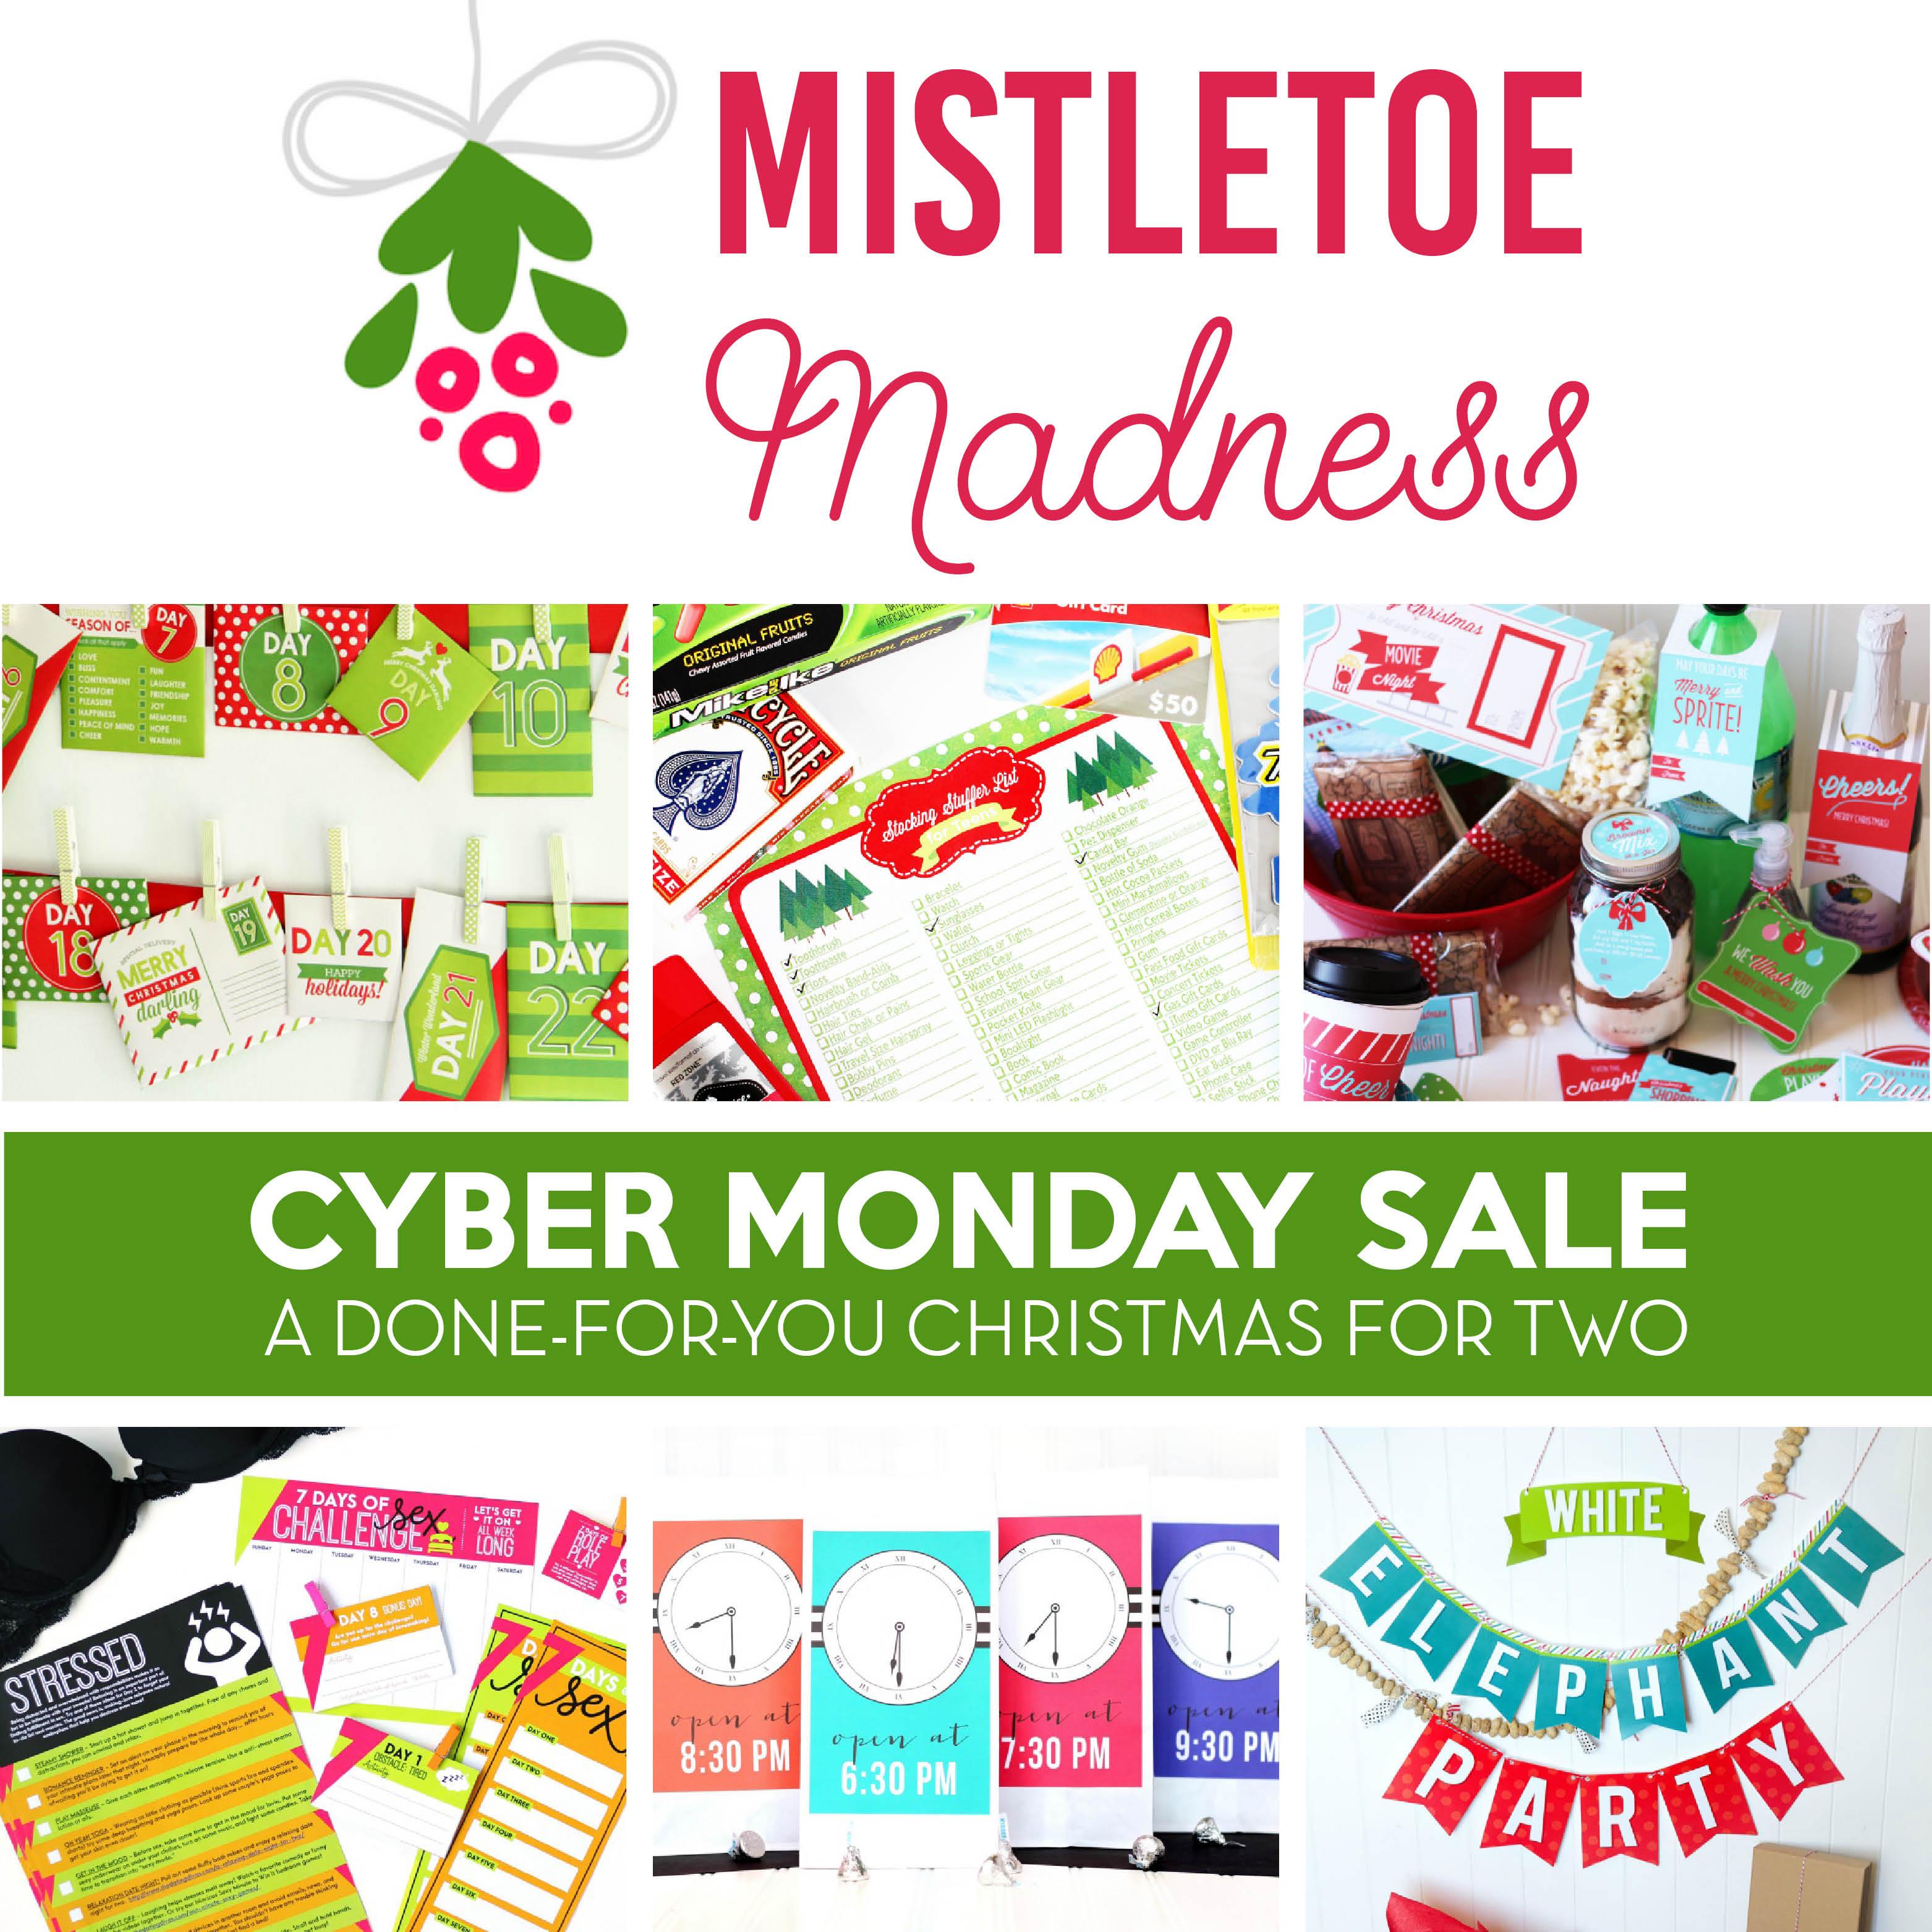 Mistletoe madness cyber monday sale the dating divas buycottarizona Image collections